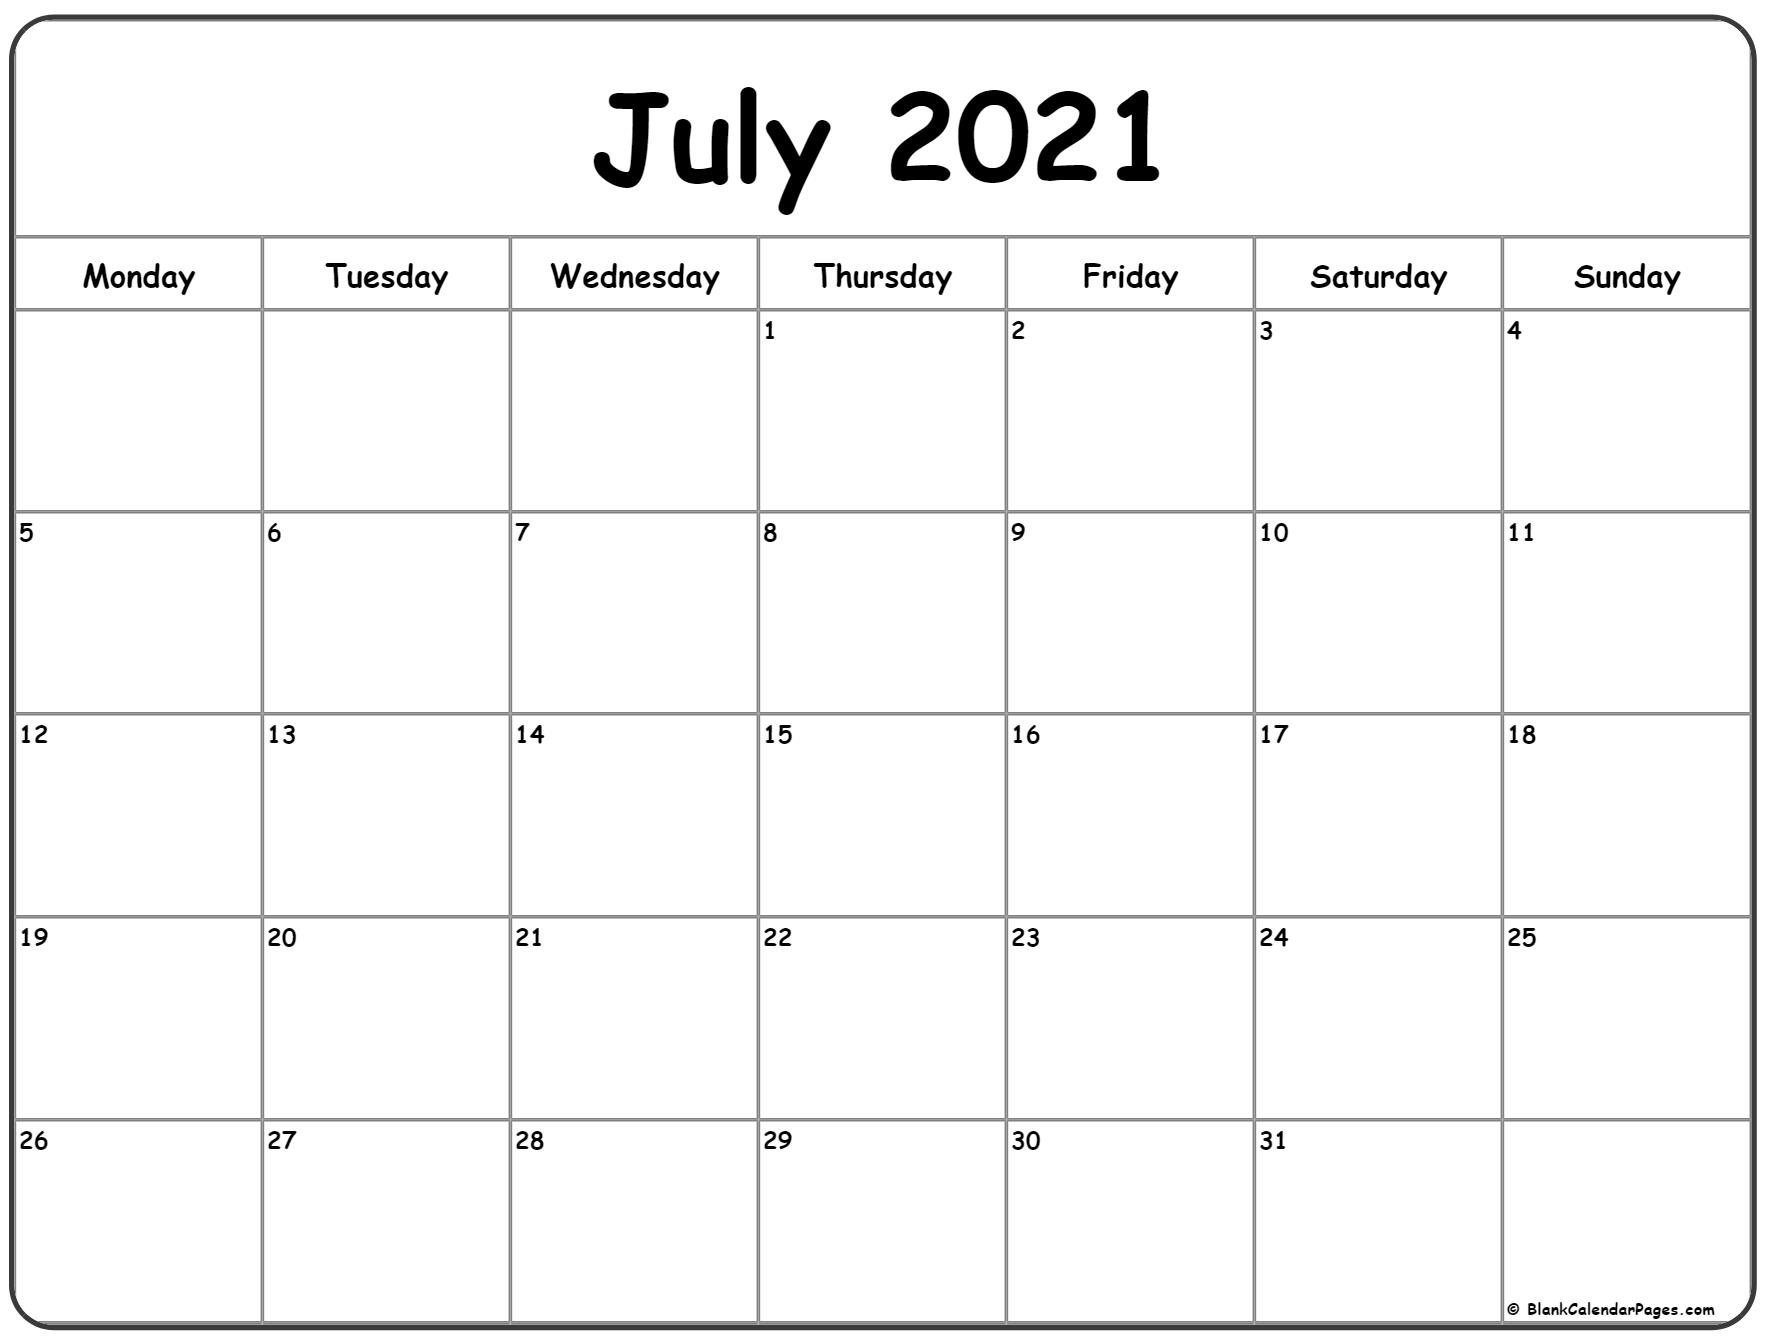 July Calendar 2021